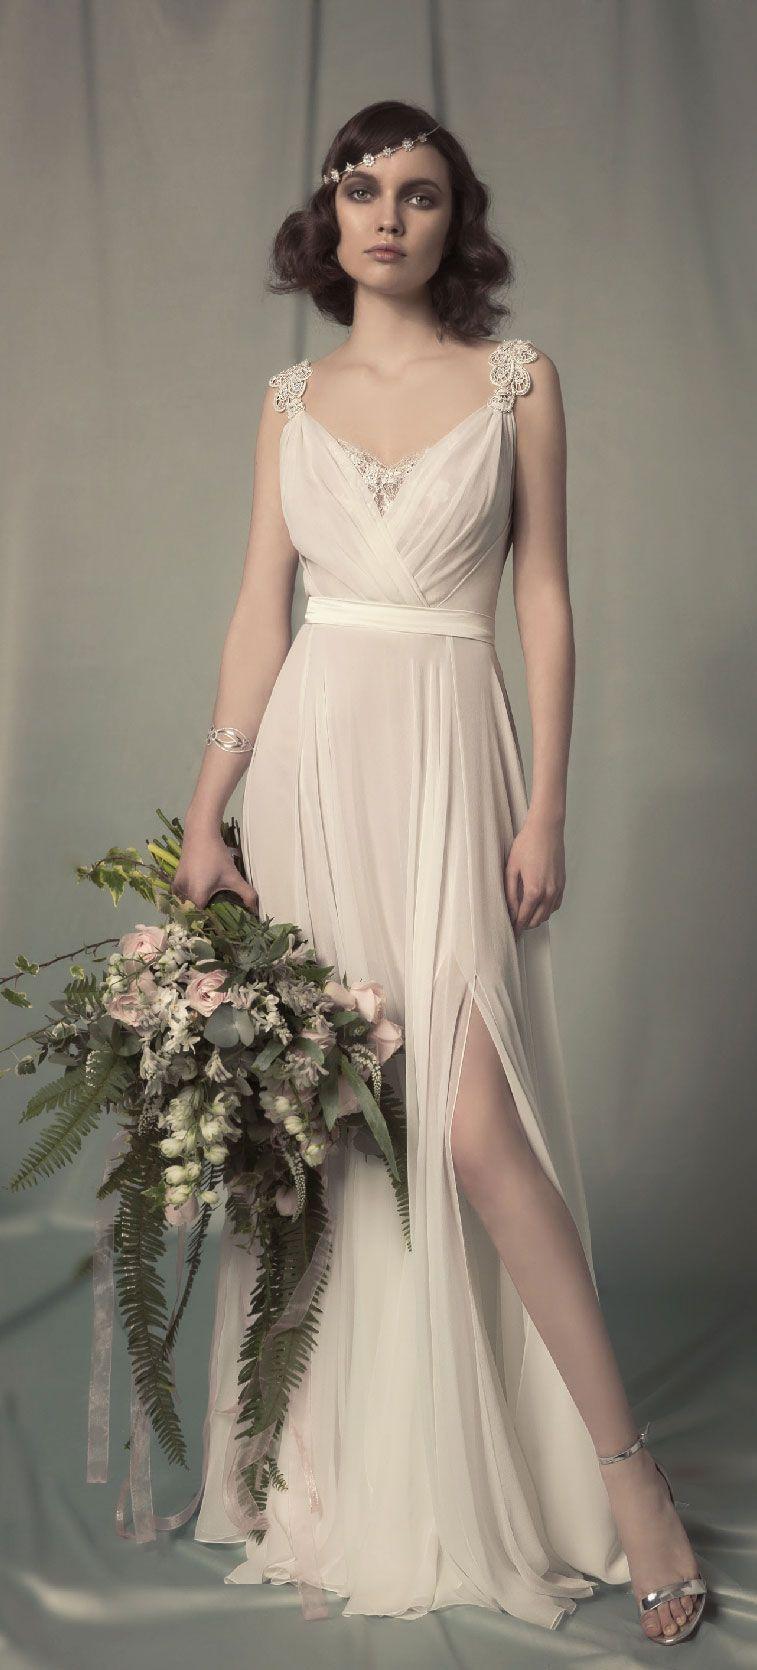 Hila gaon wedding dresses weddingdress weddinggown